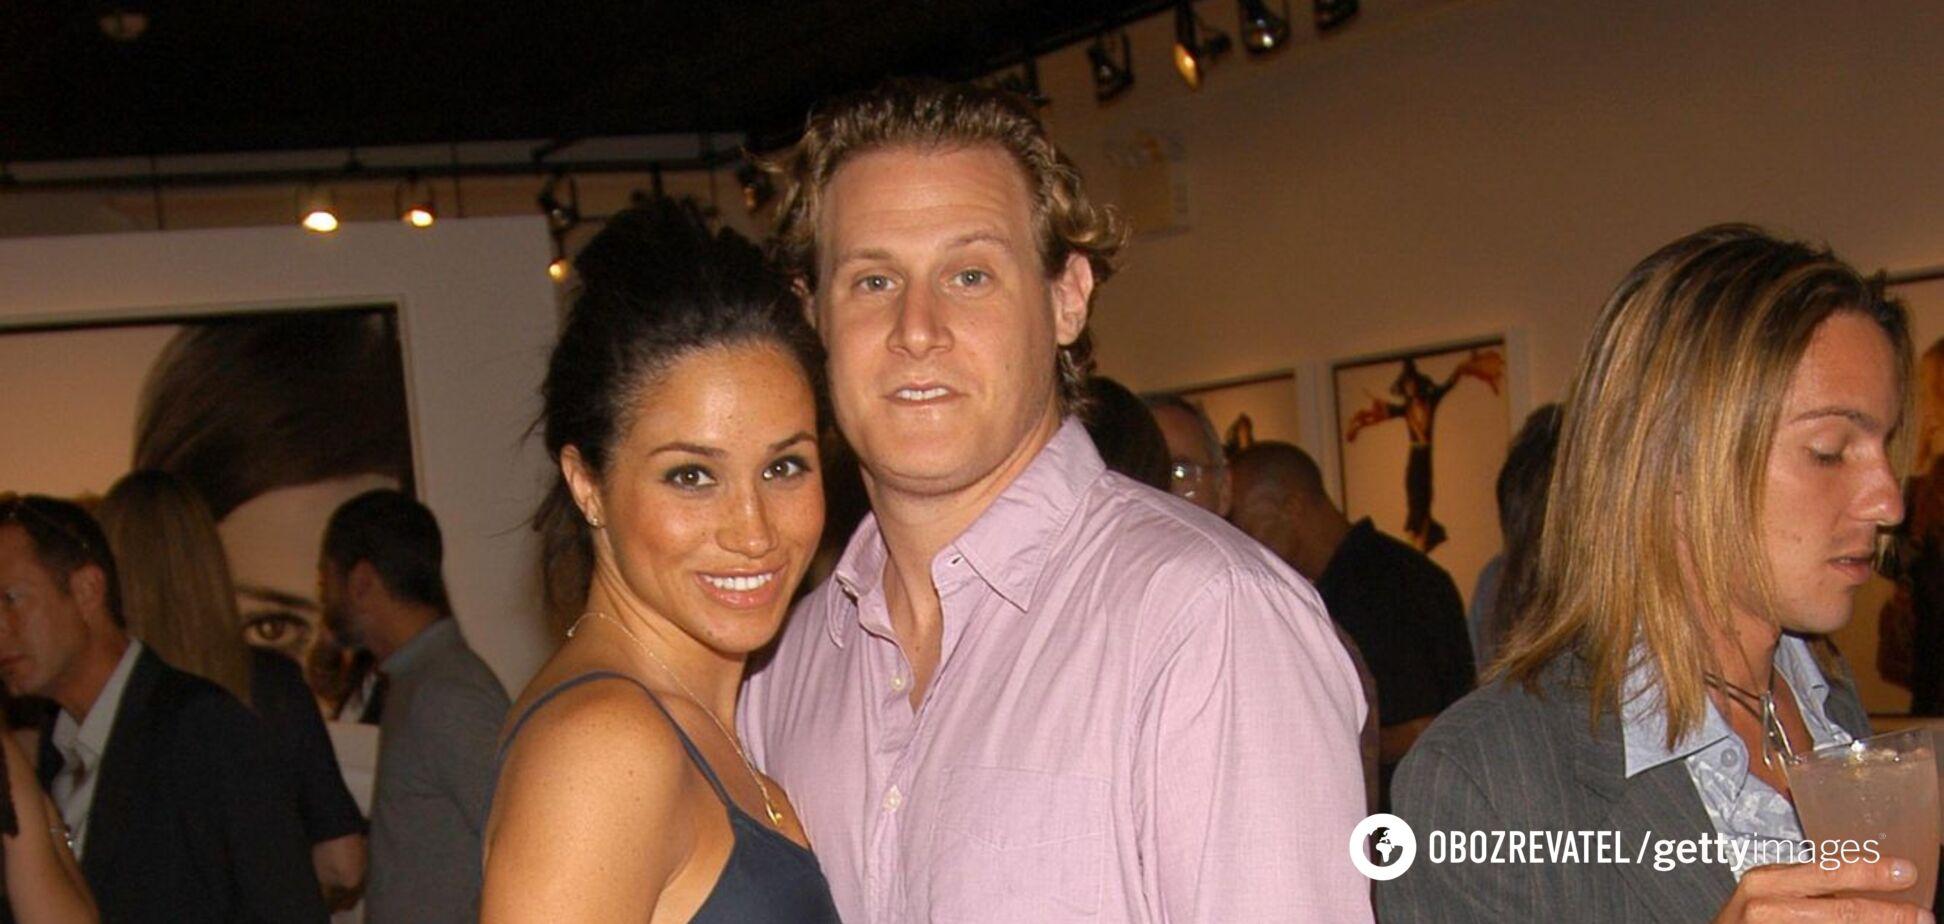 Бывший муж Меган Маркл раскрыл подробности развода